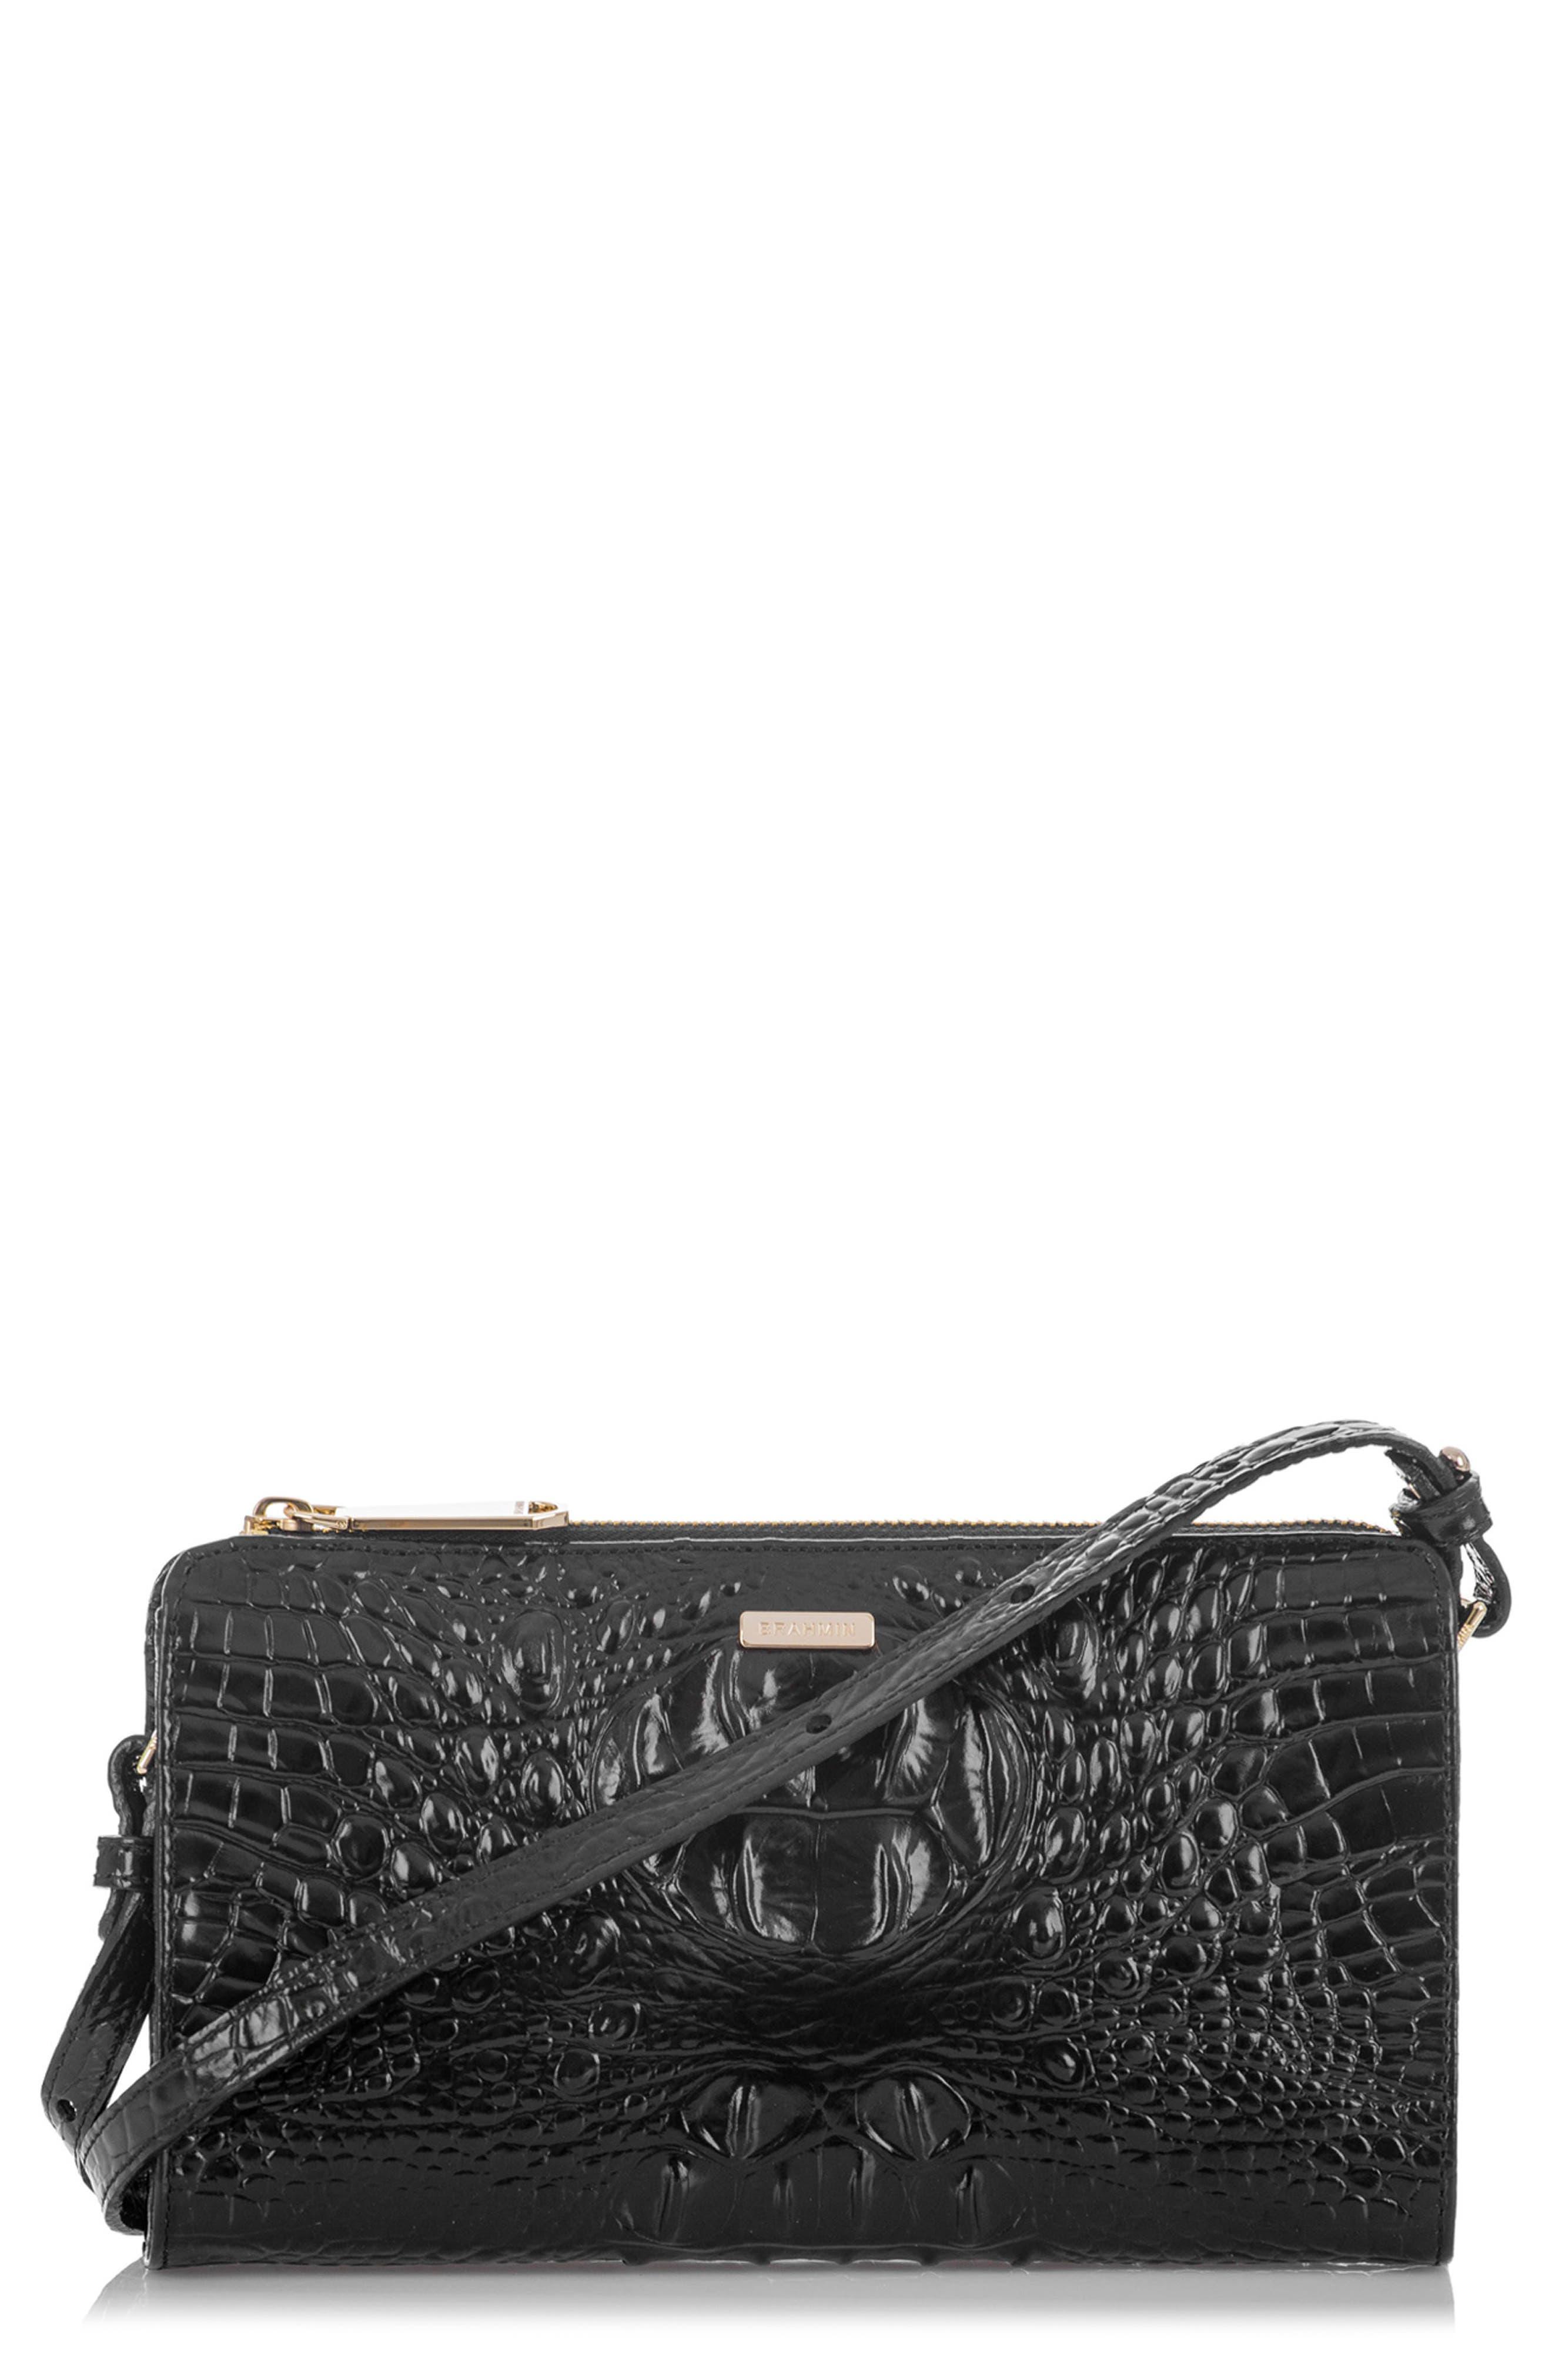 Sienna Leather Crossbody Bag,                             Main thumbnail 1, color,                             Black